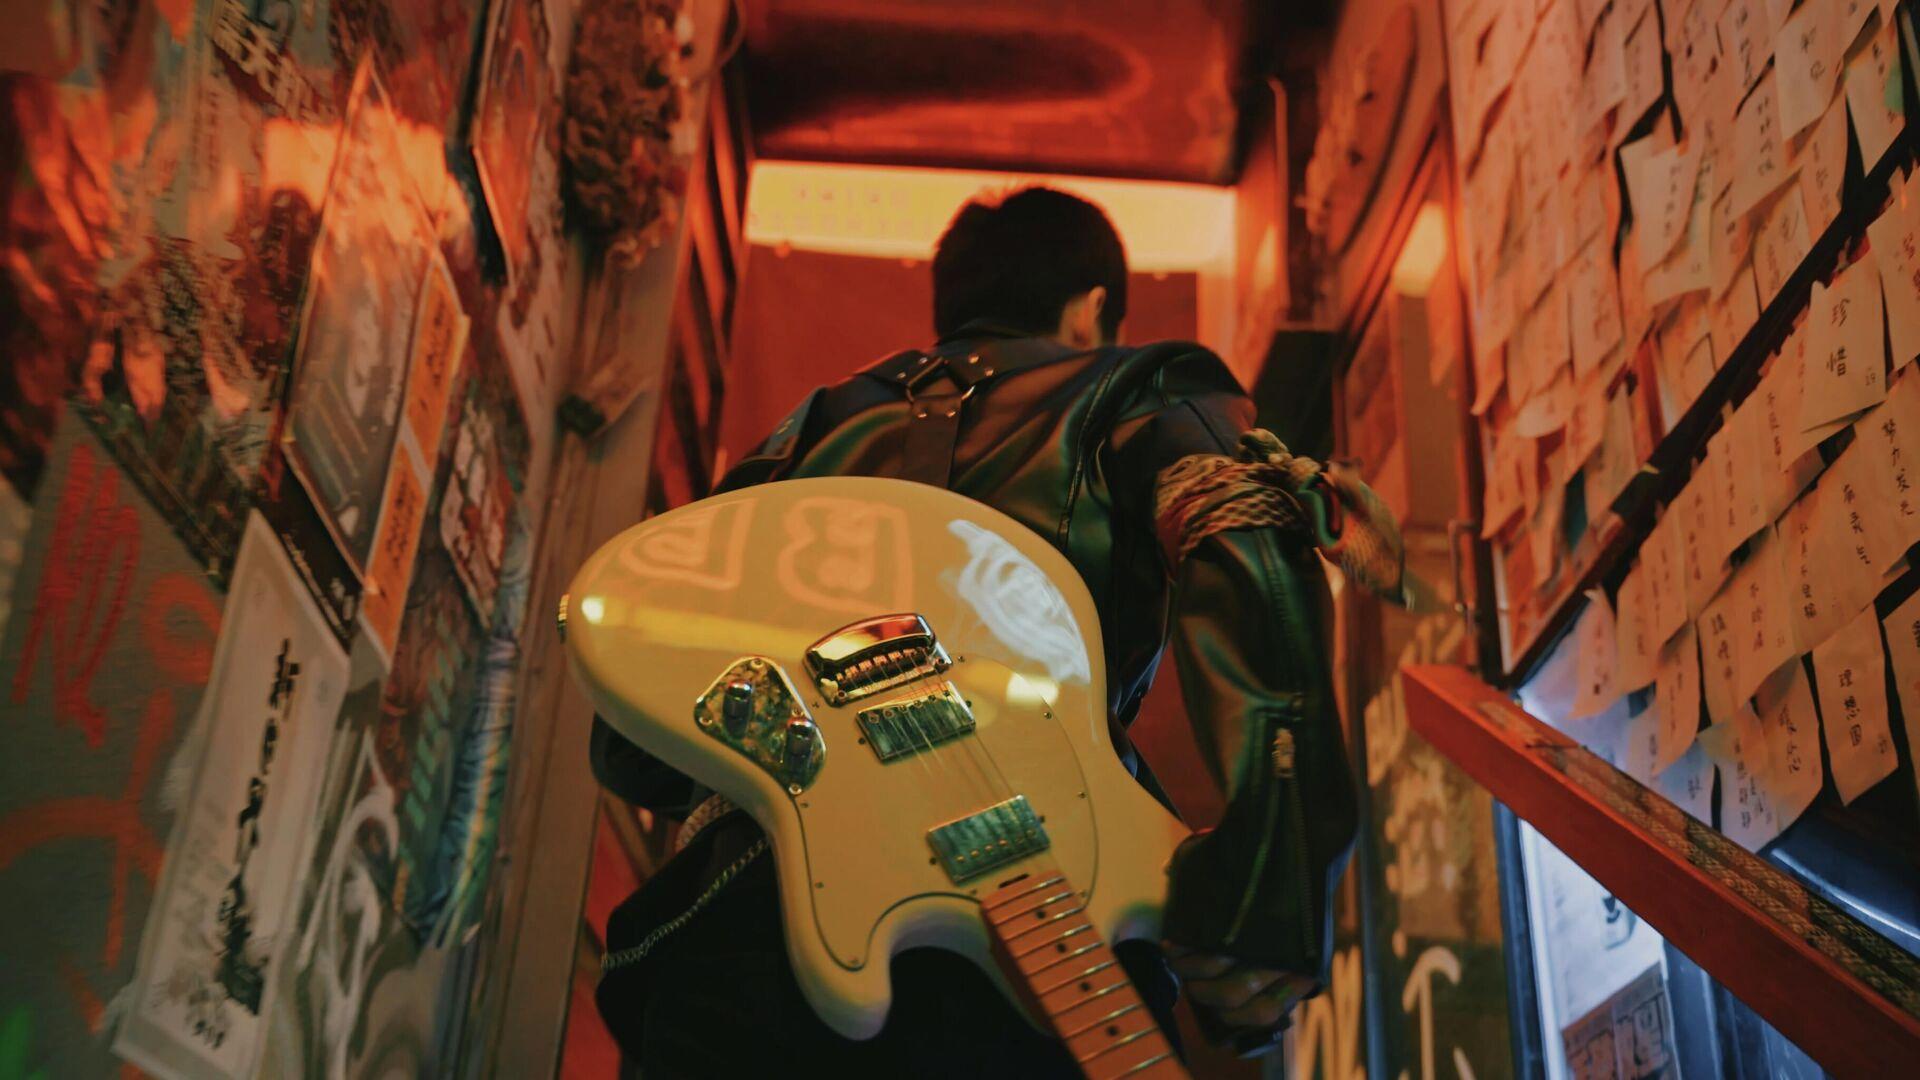 Un hombre con guitarra - Sputnik Mundo, 1920, 01.10.2021